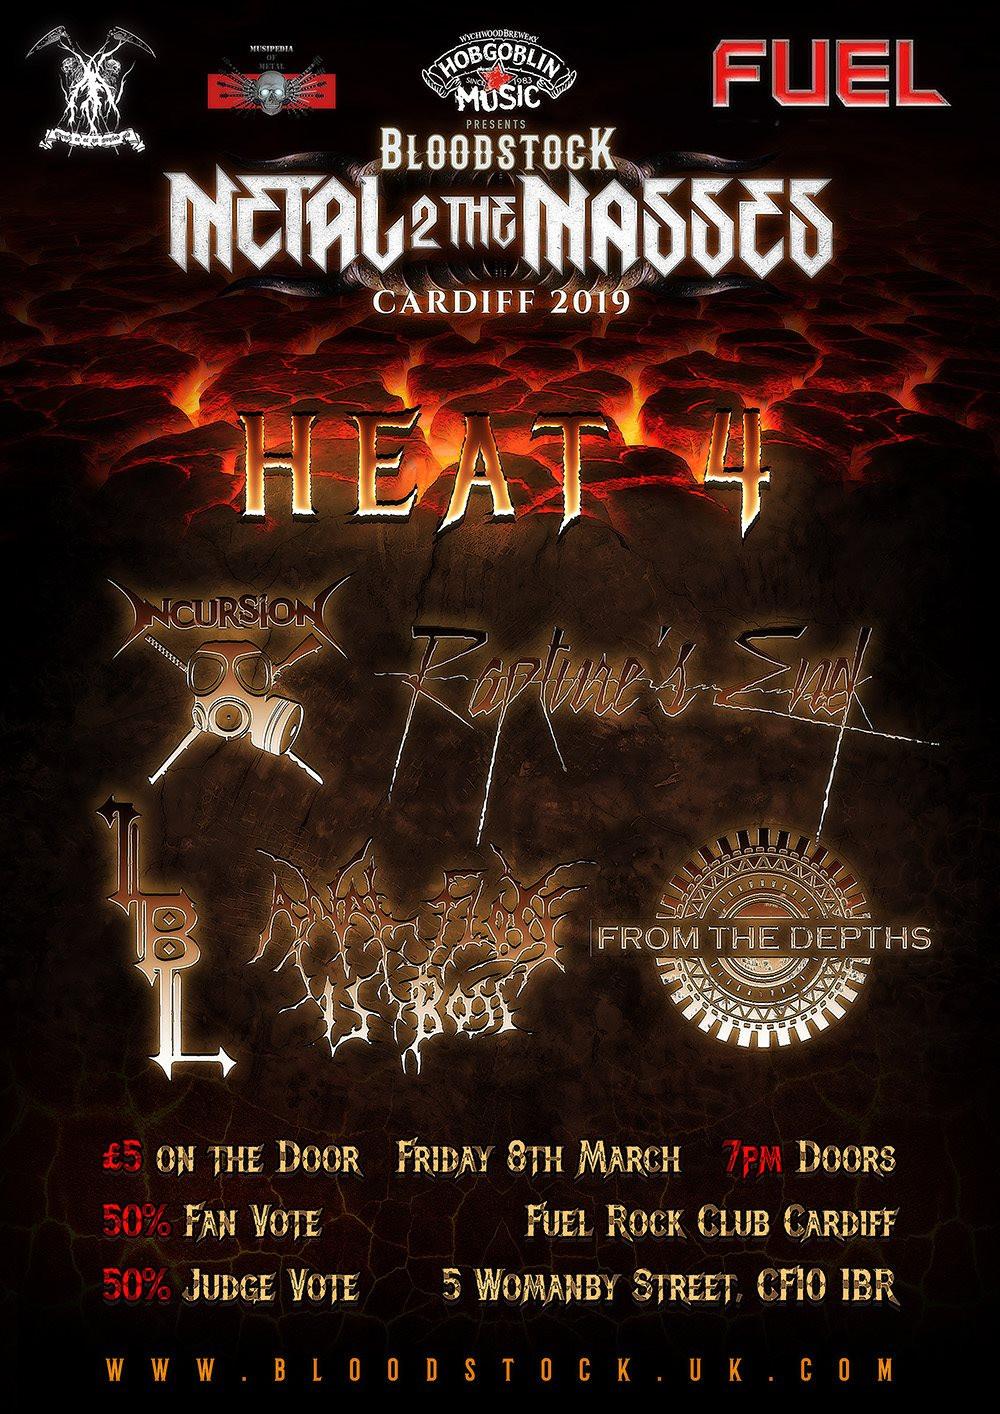 Metal 2 the Masses Cardiff 2019 Heat 4